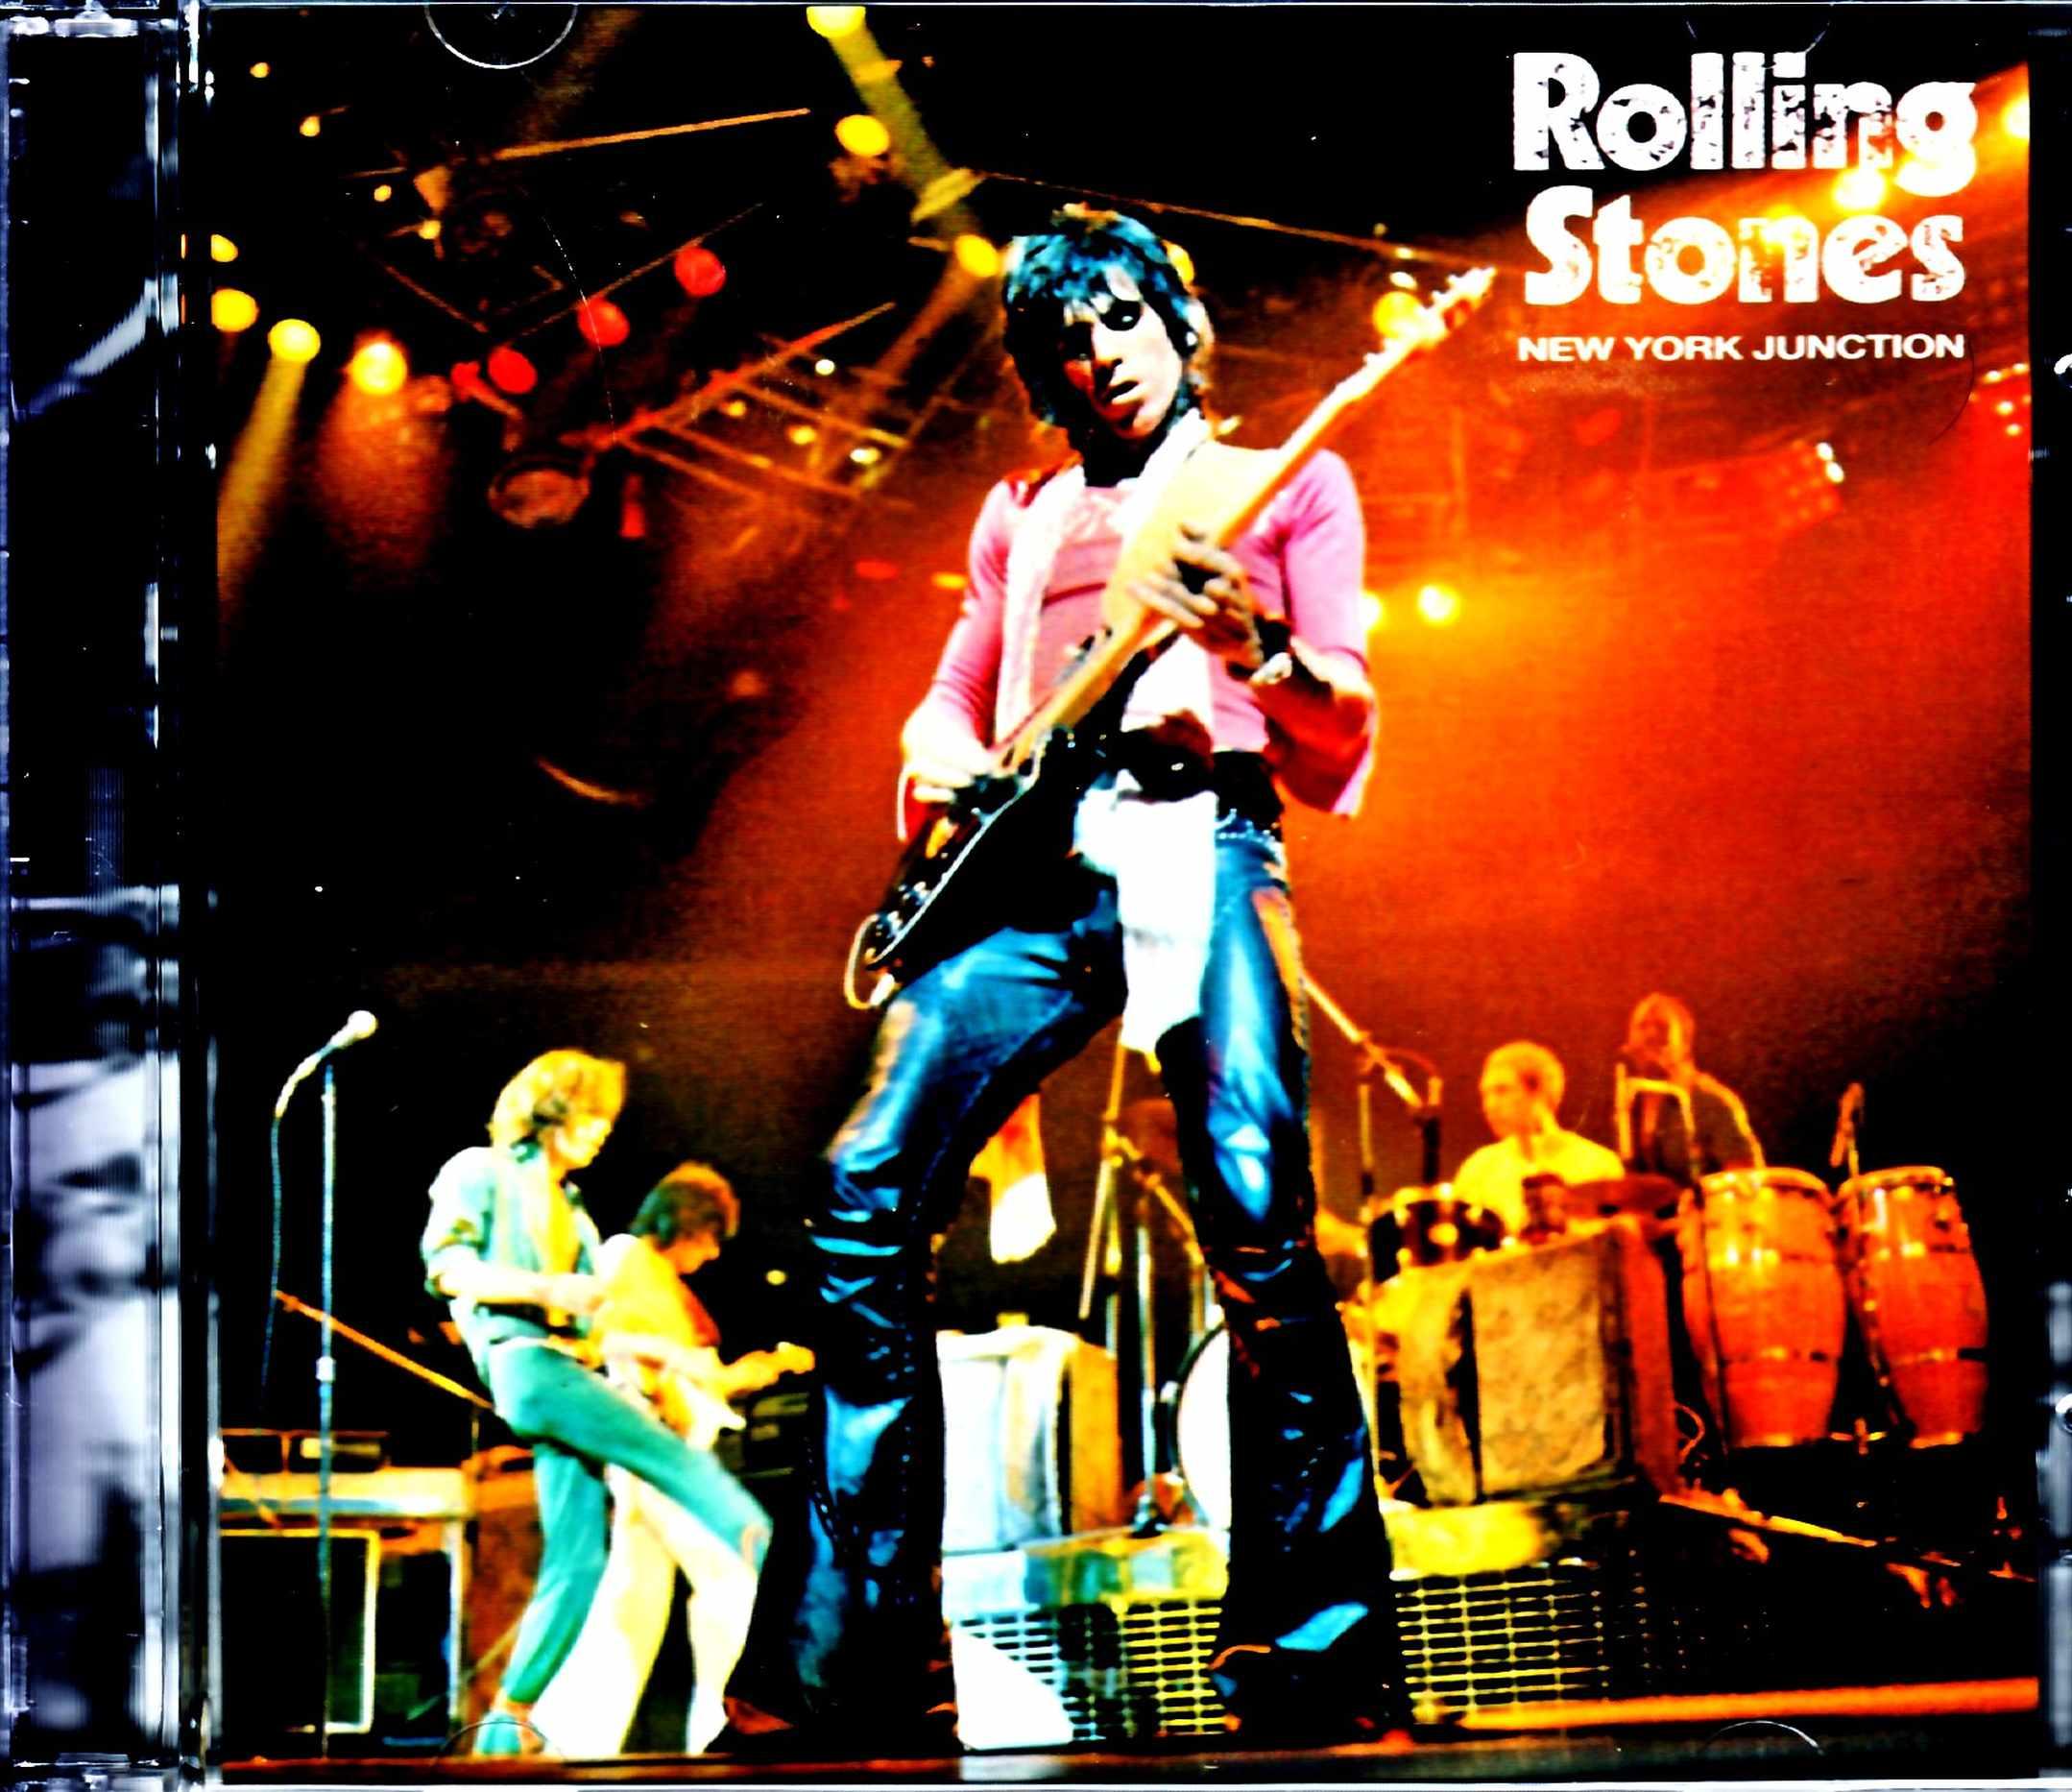 Rolling Stones ローリング・ストーンズ/NY,USA 6.26.1975